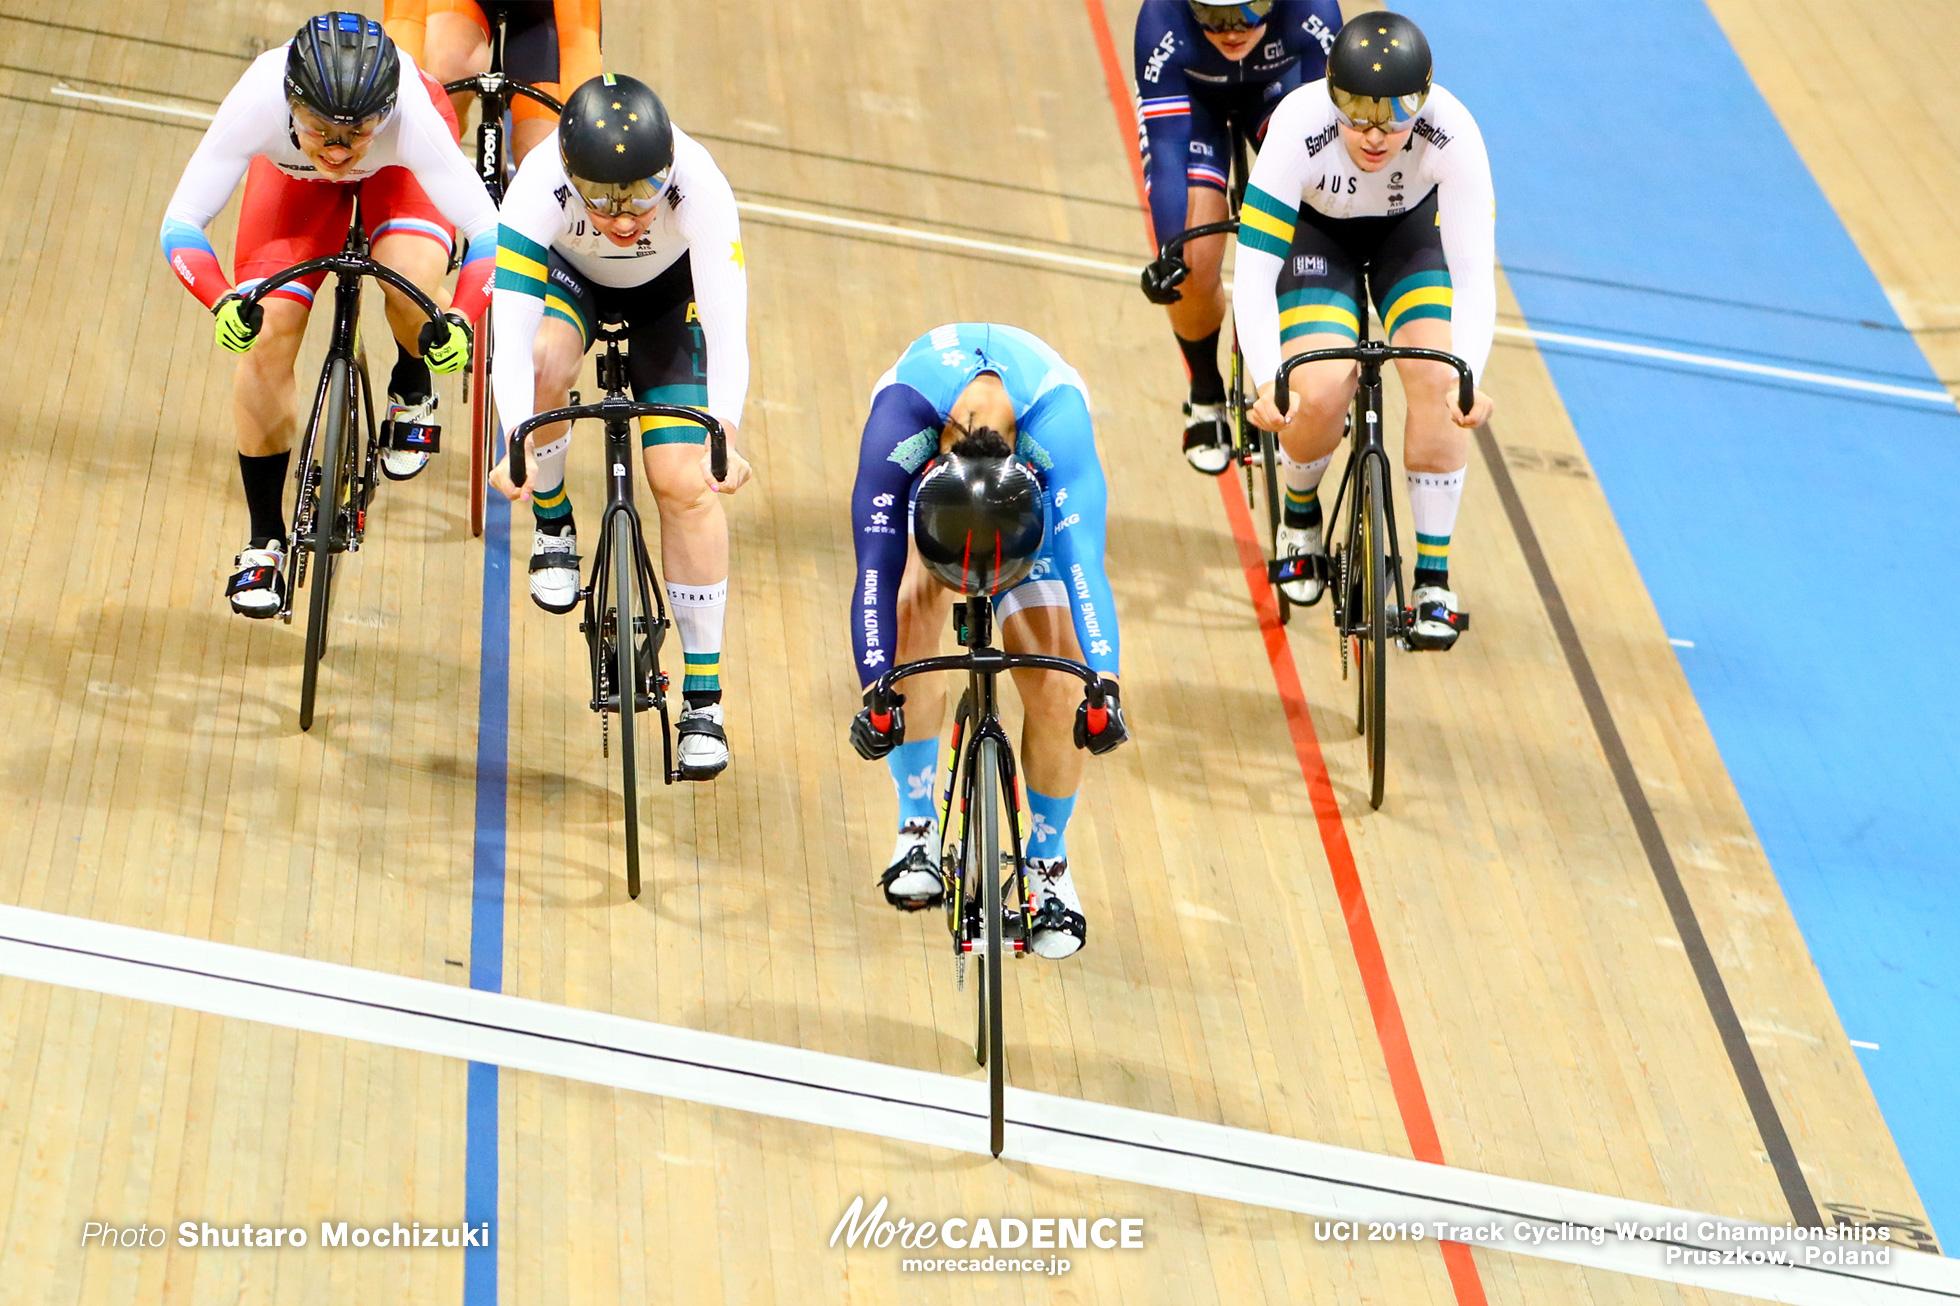 Women's Keirin Final / 2019 Track Cycling World Championships Pruszków, Poland